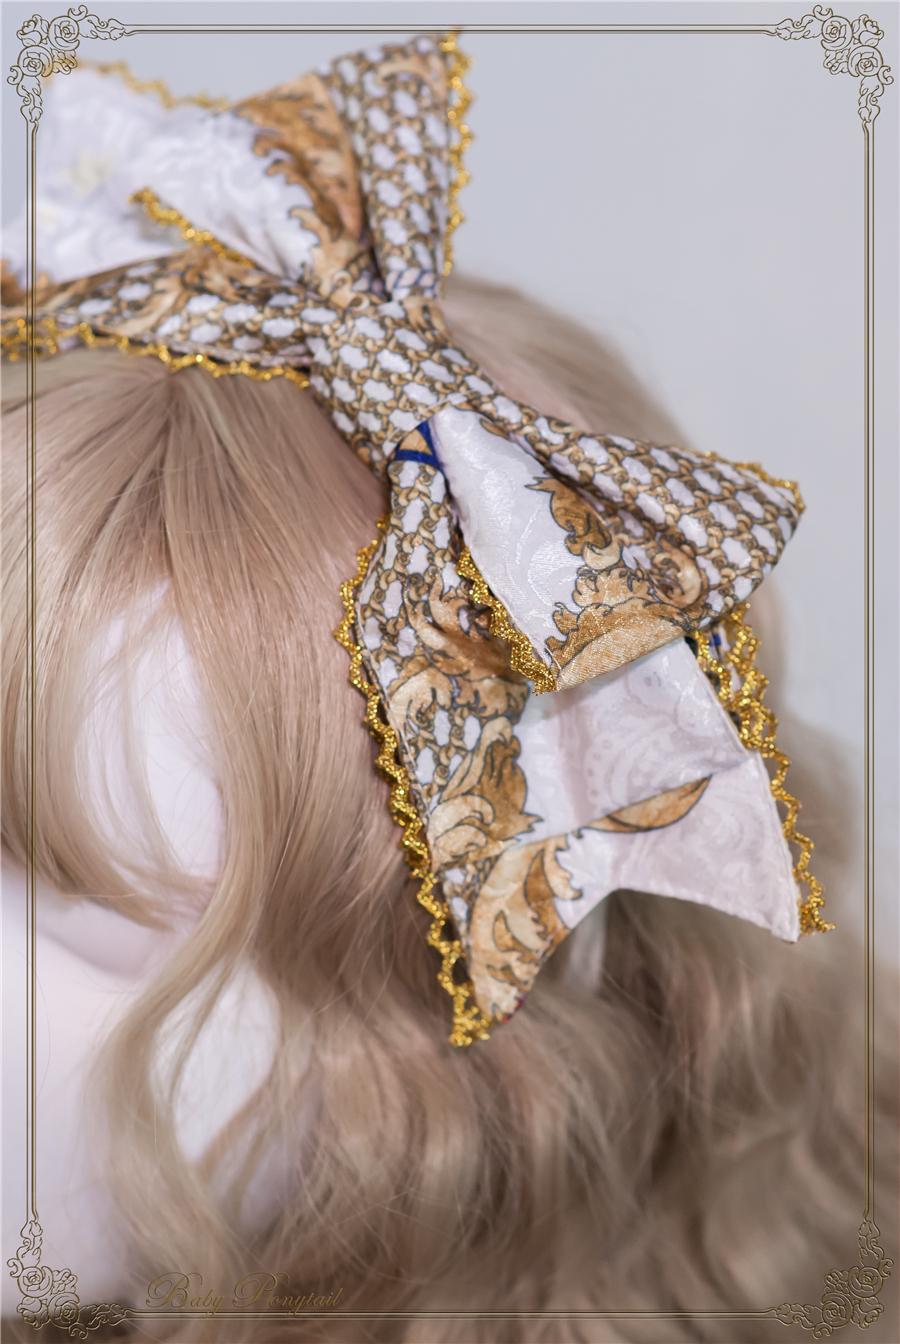 Baby Ponytail_Stock photo_Circus Princess_KC Silver_05.jpg